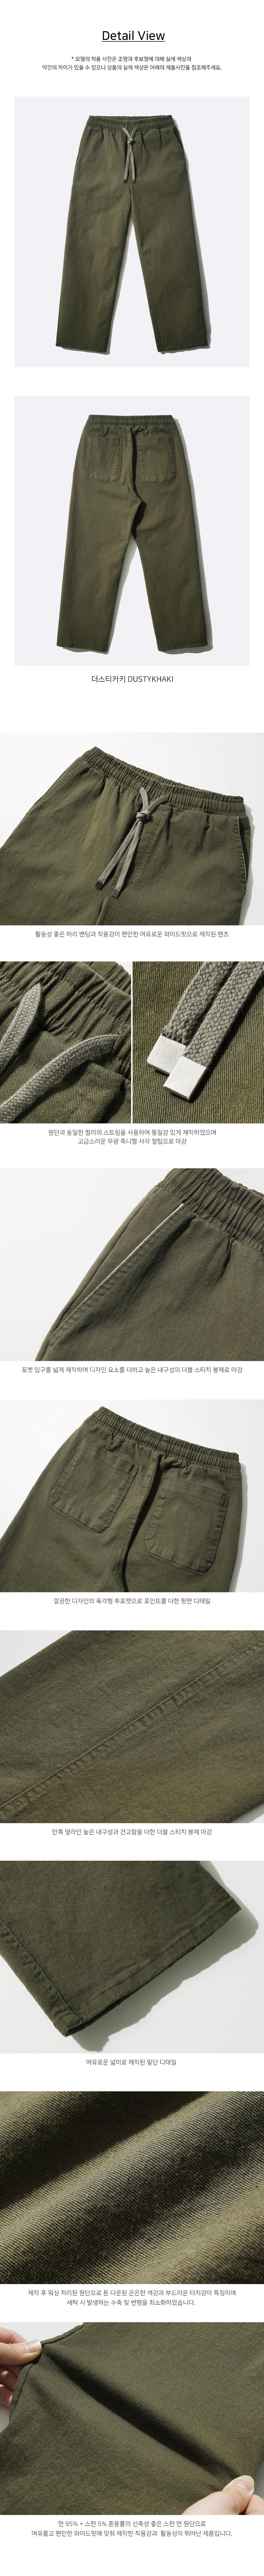 KJLP2338_detail_khaki_oy.jpg